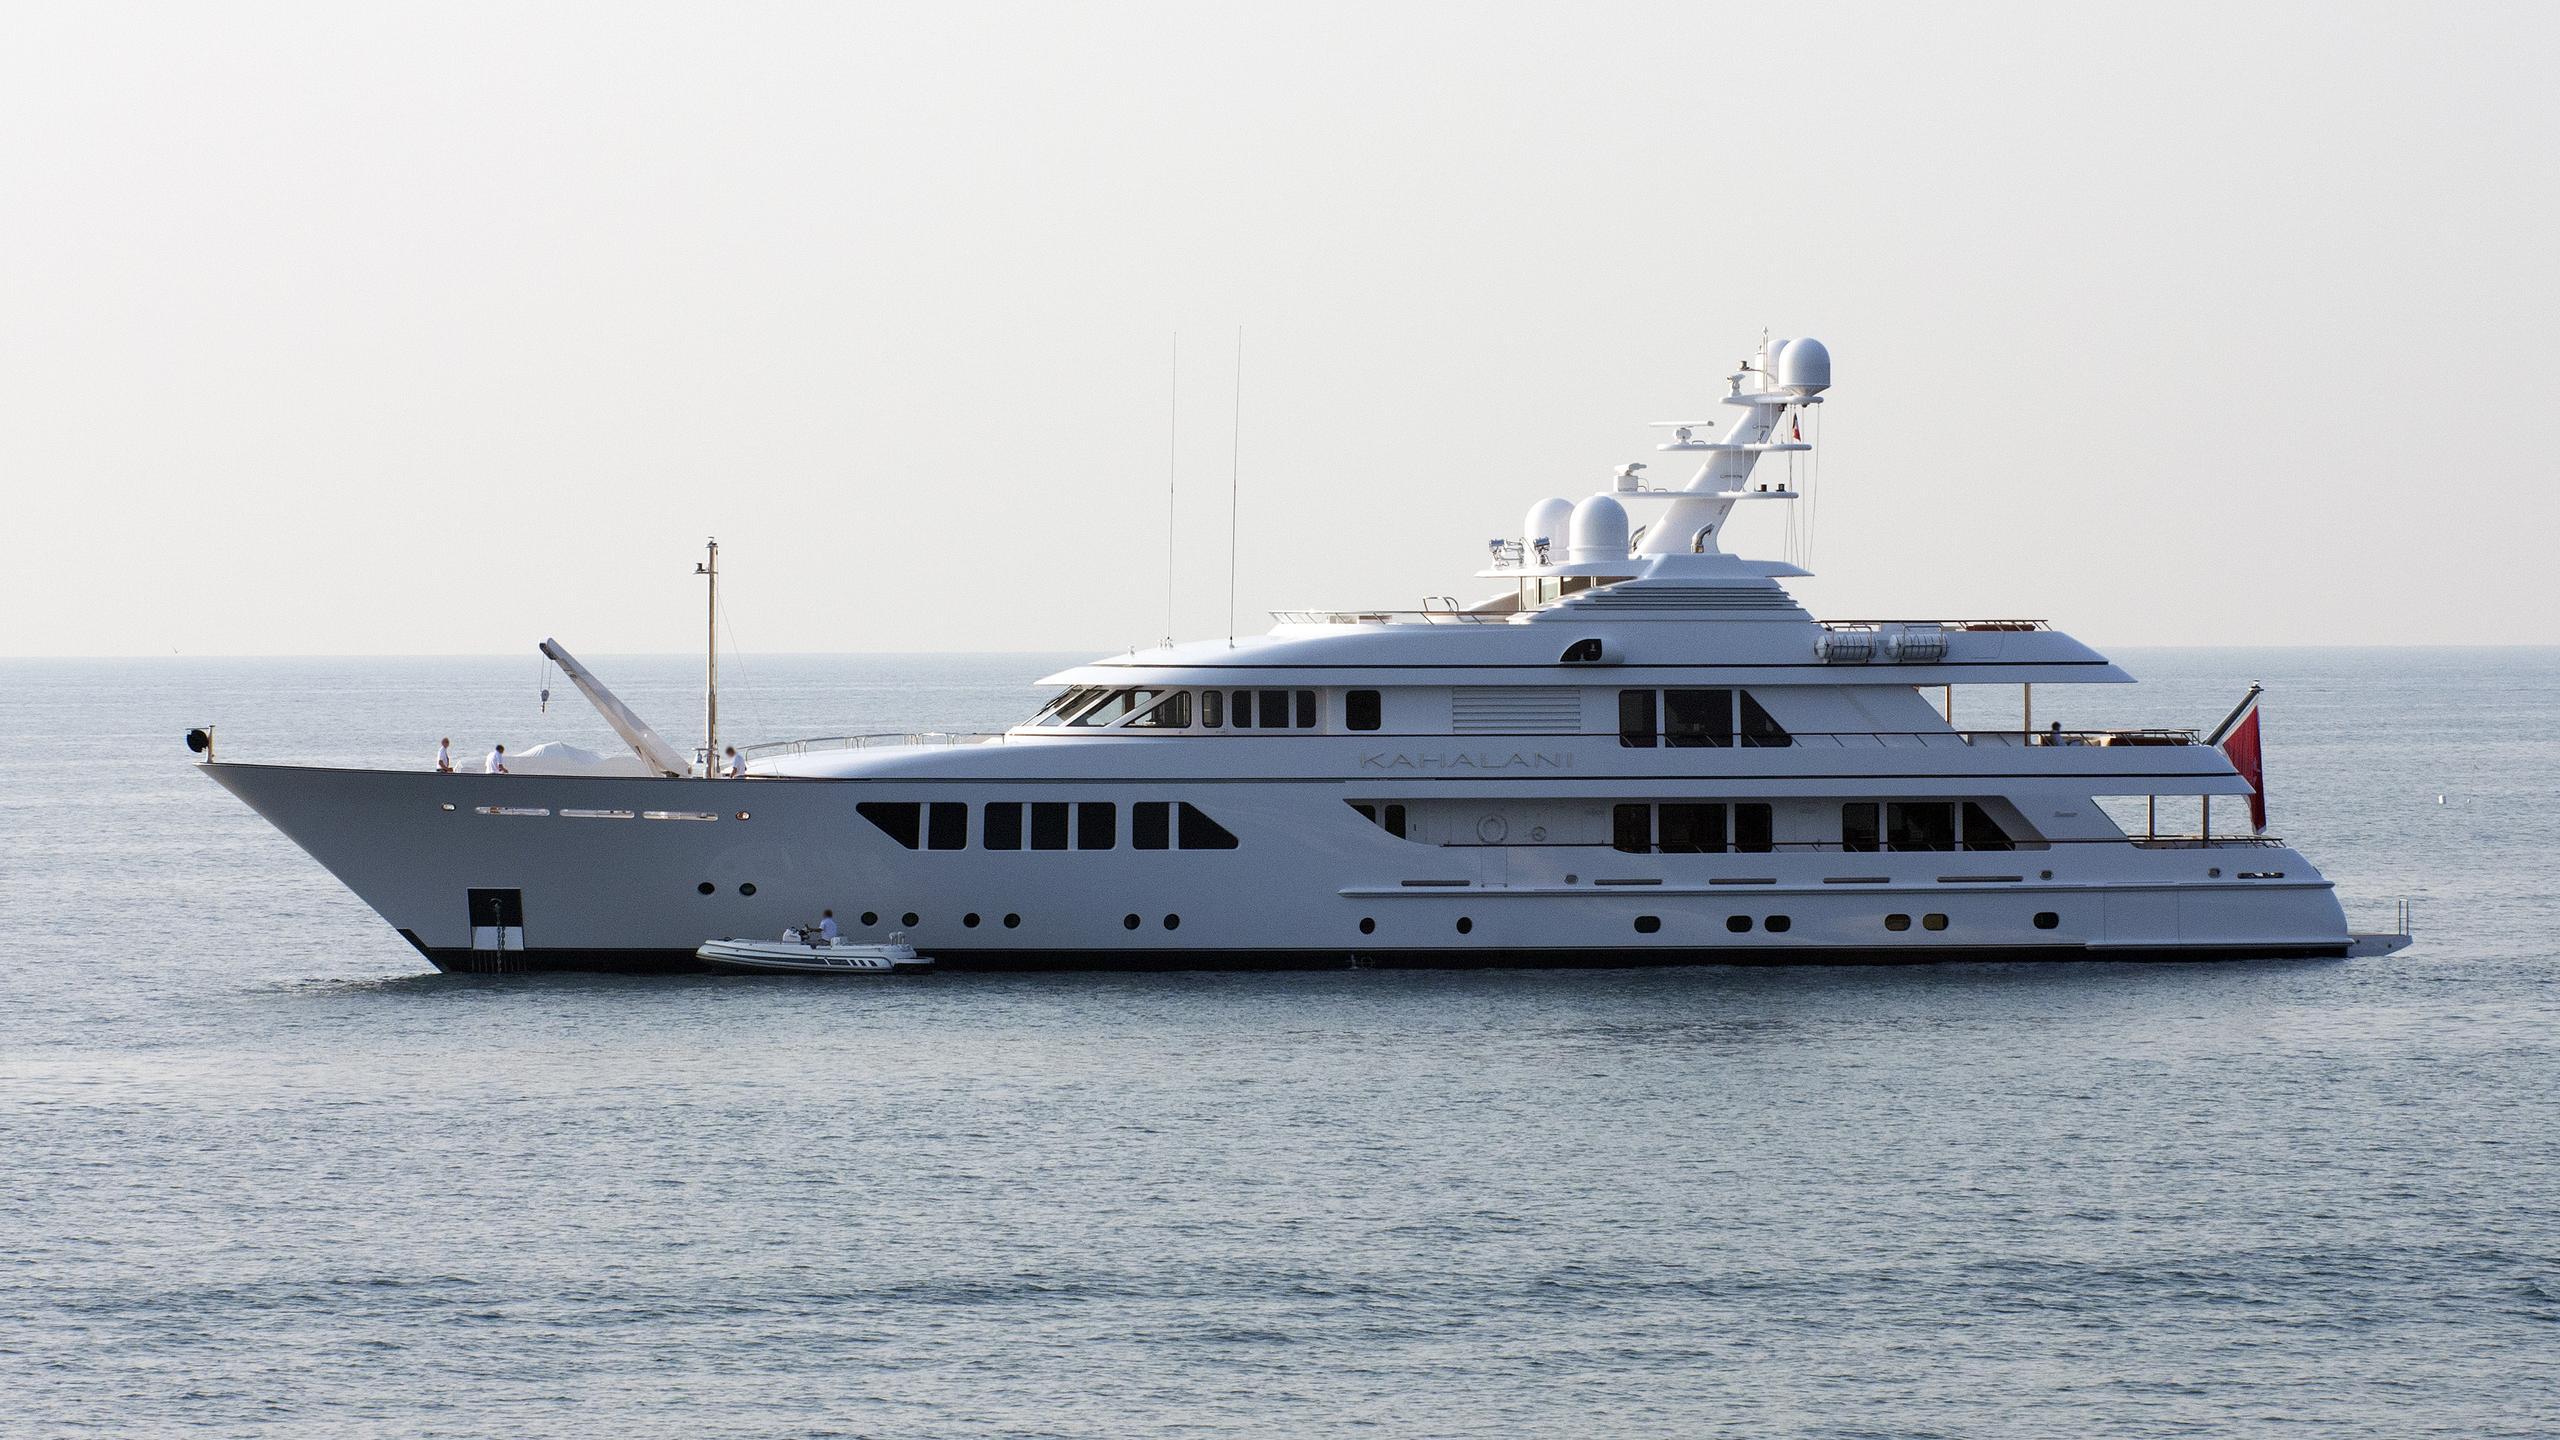 kahalani-motor-yacht-feadship-2010-55m-profile